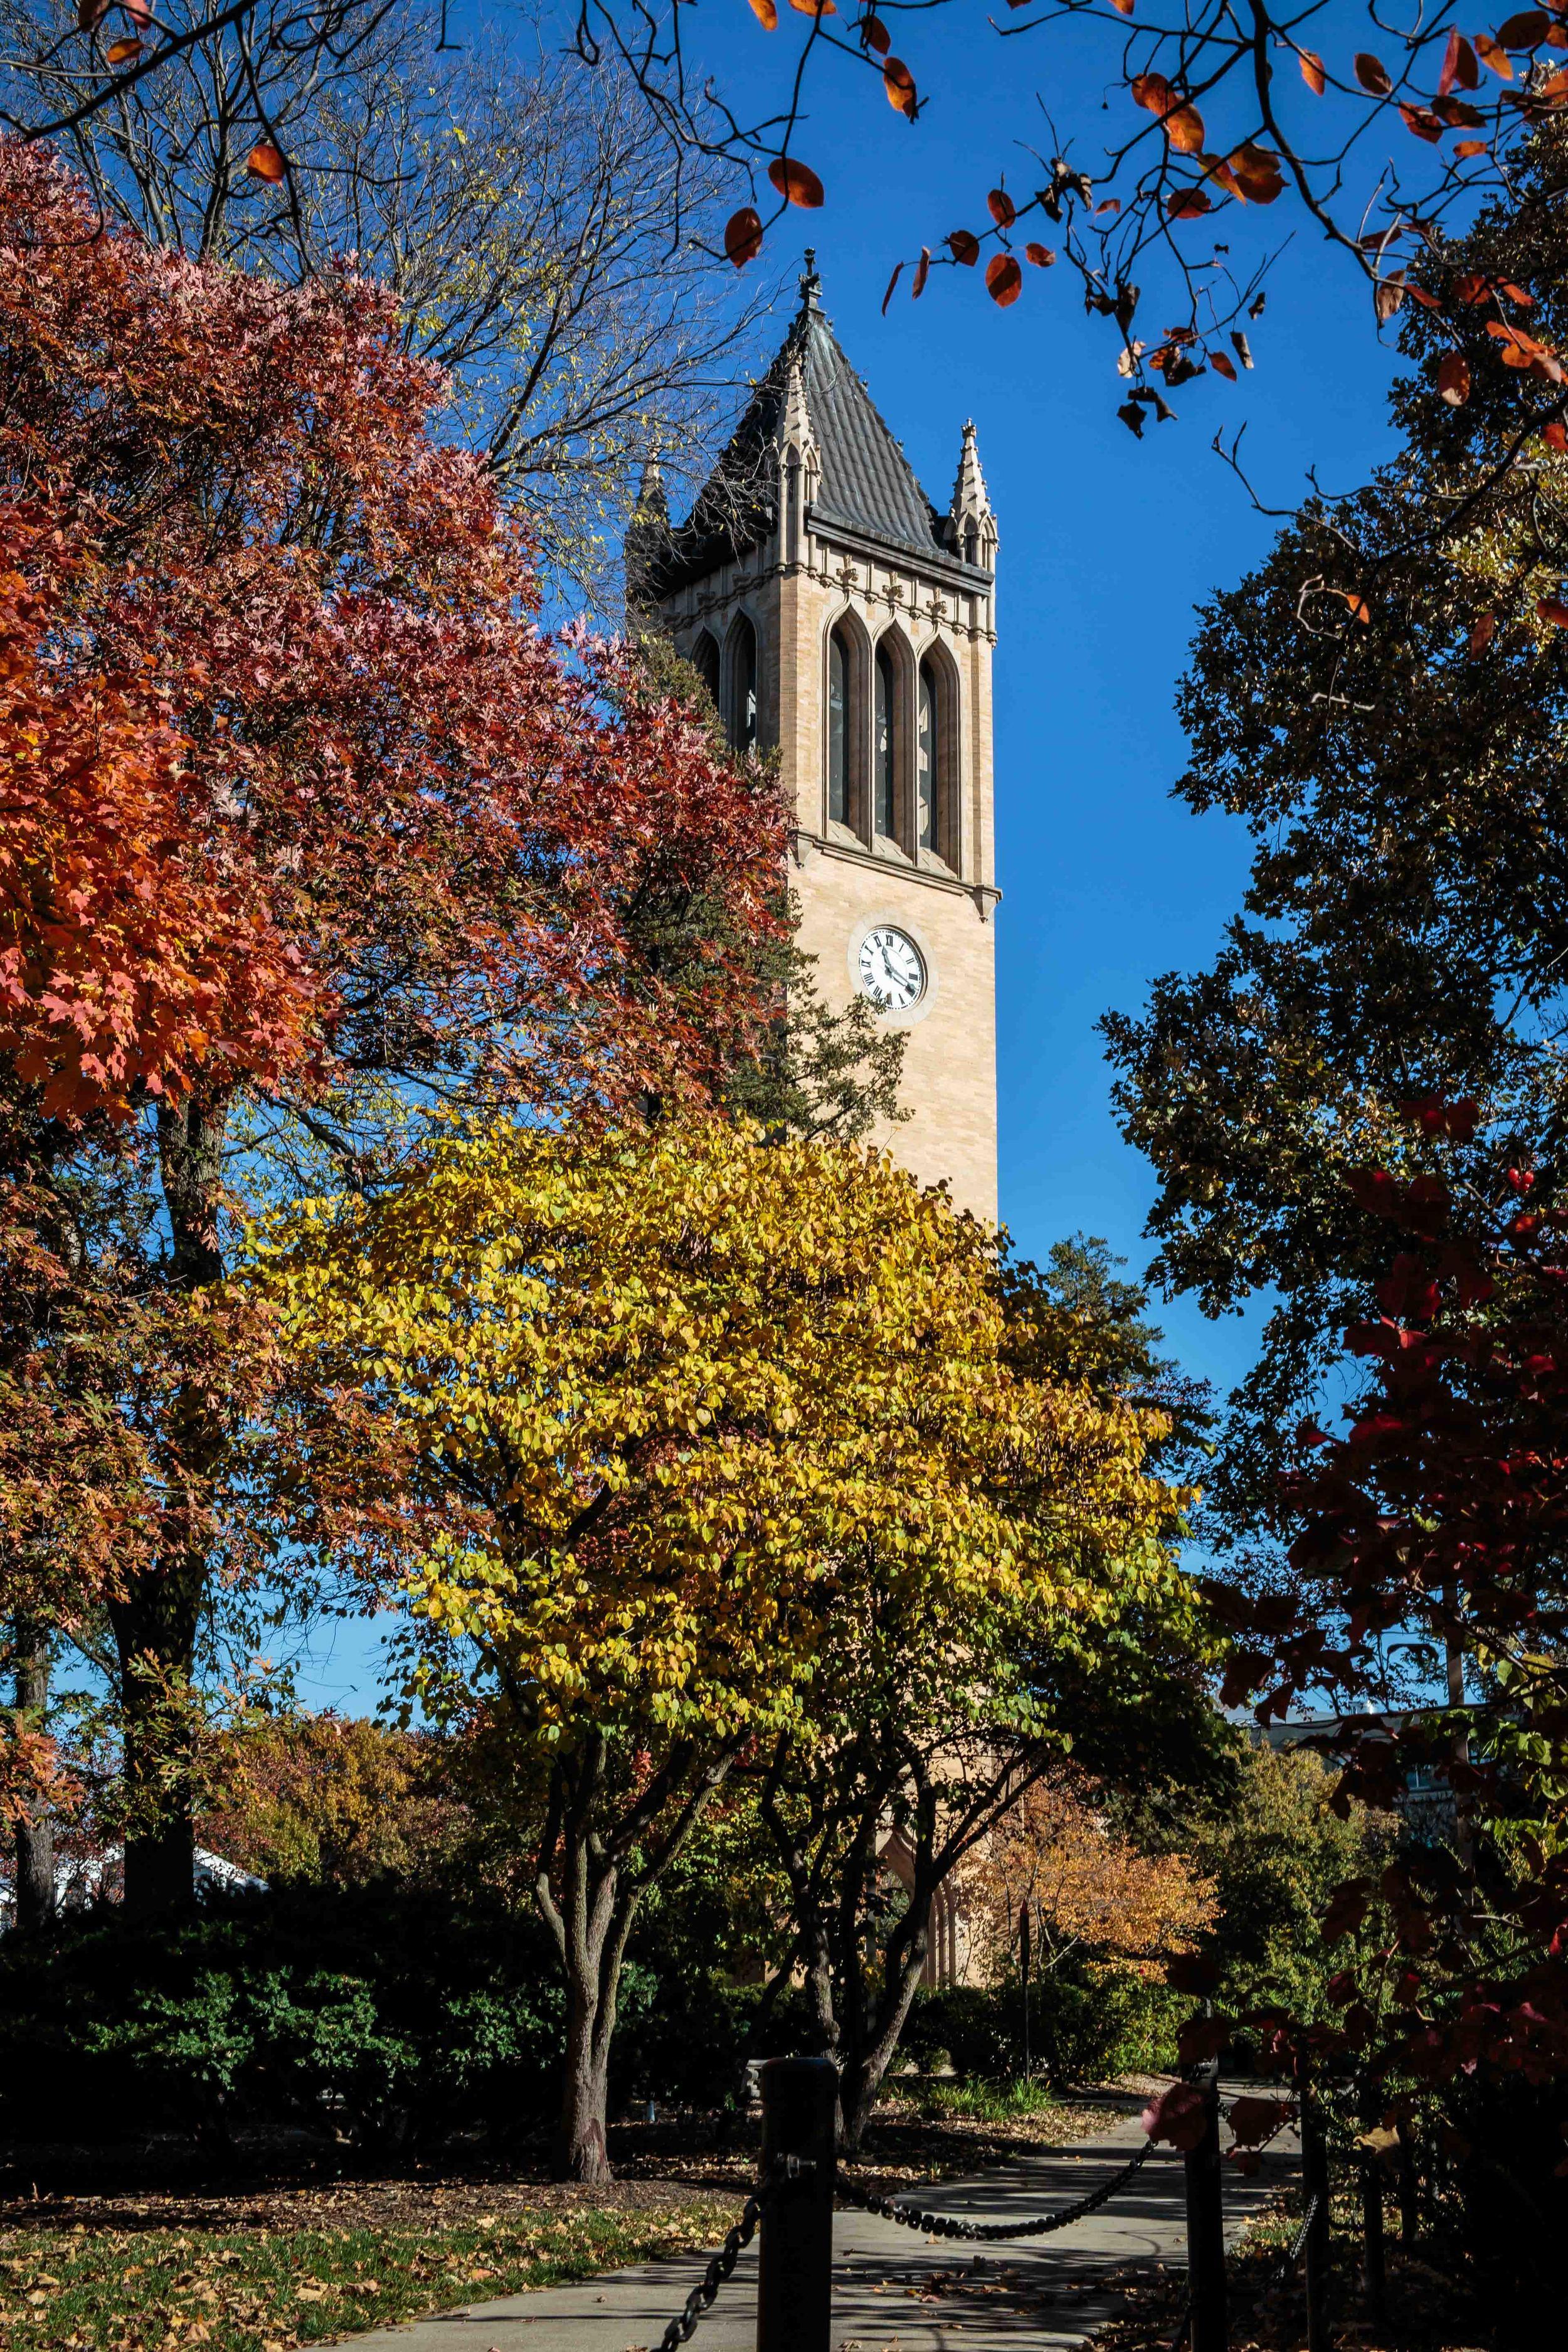 """The Bells of Iowa State"", Iowa State University Campanile, Ames, Iowa"